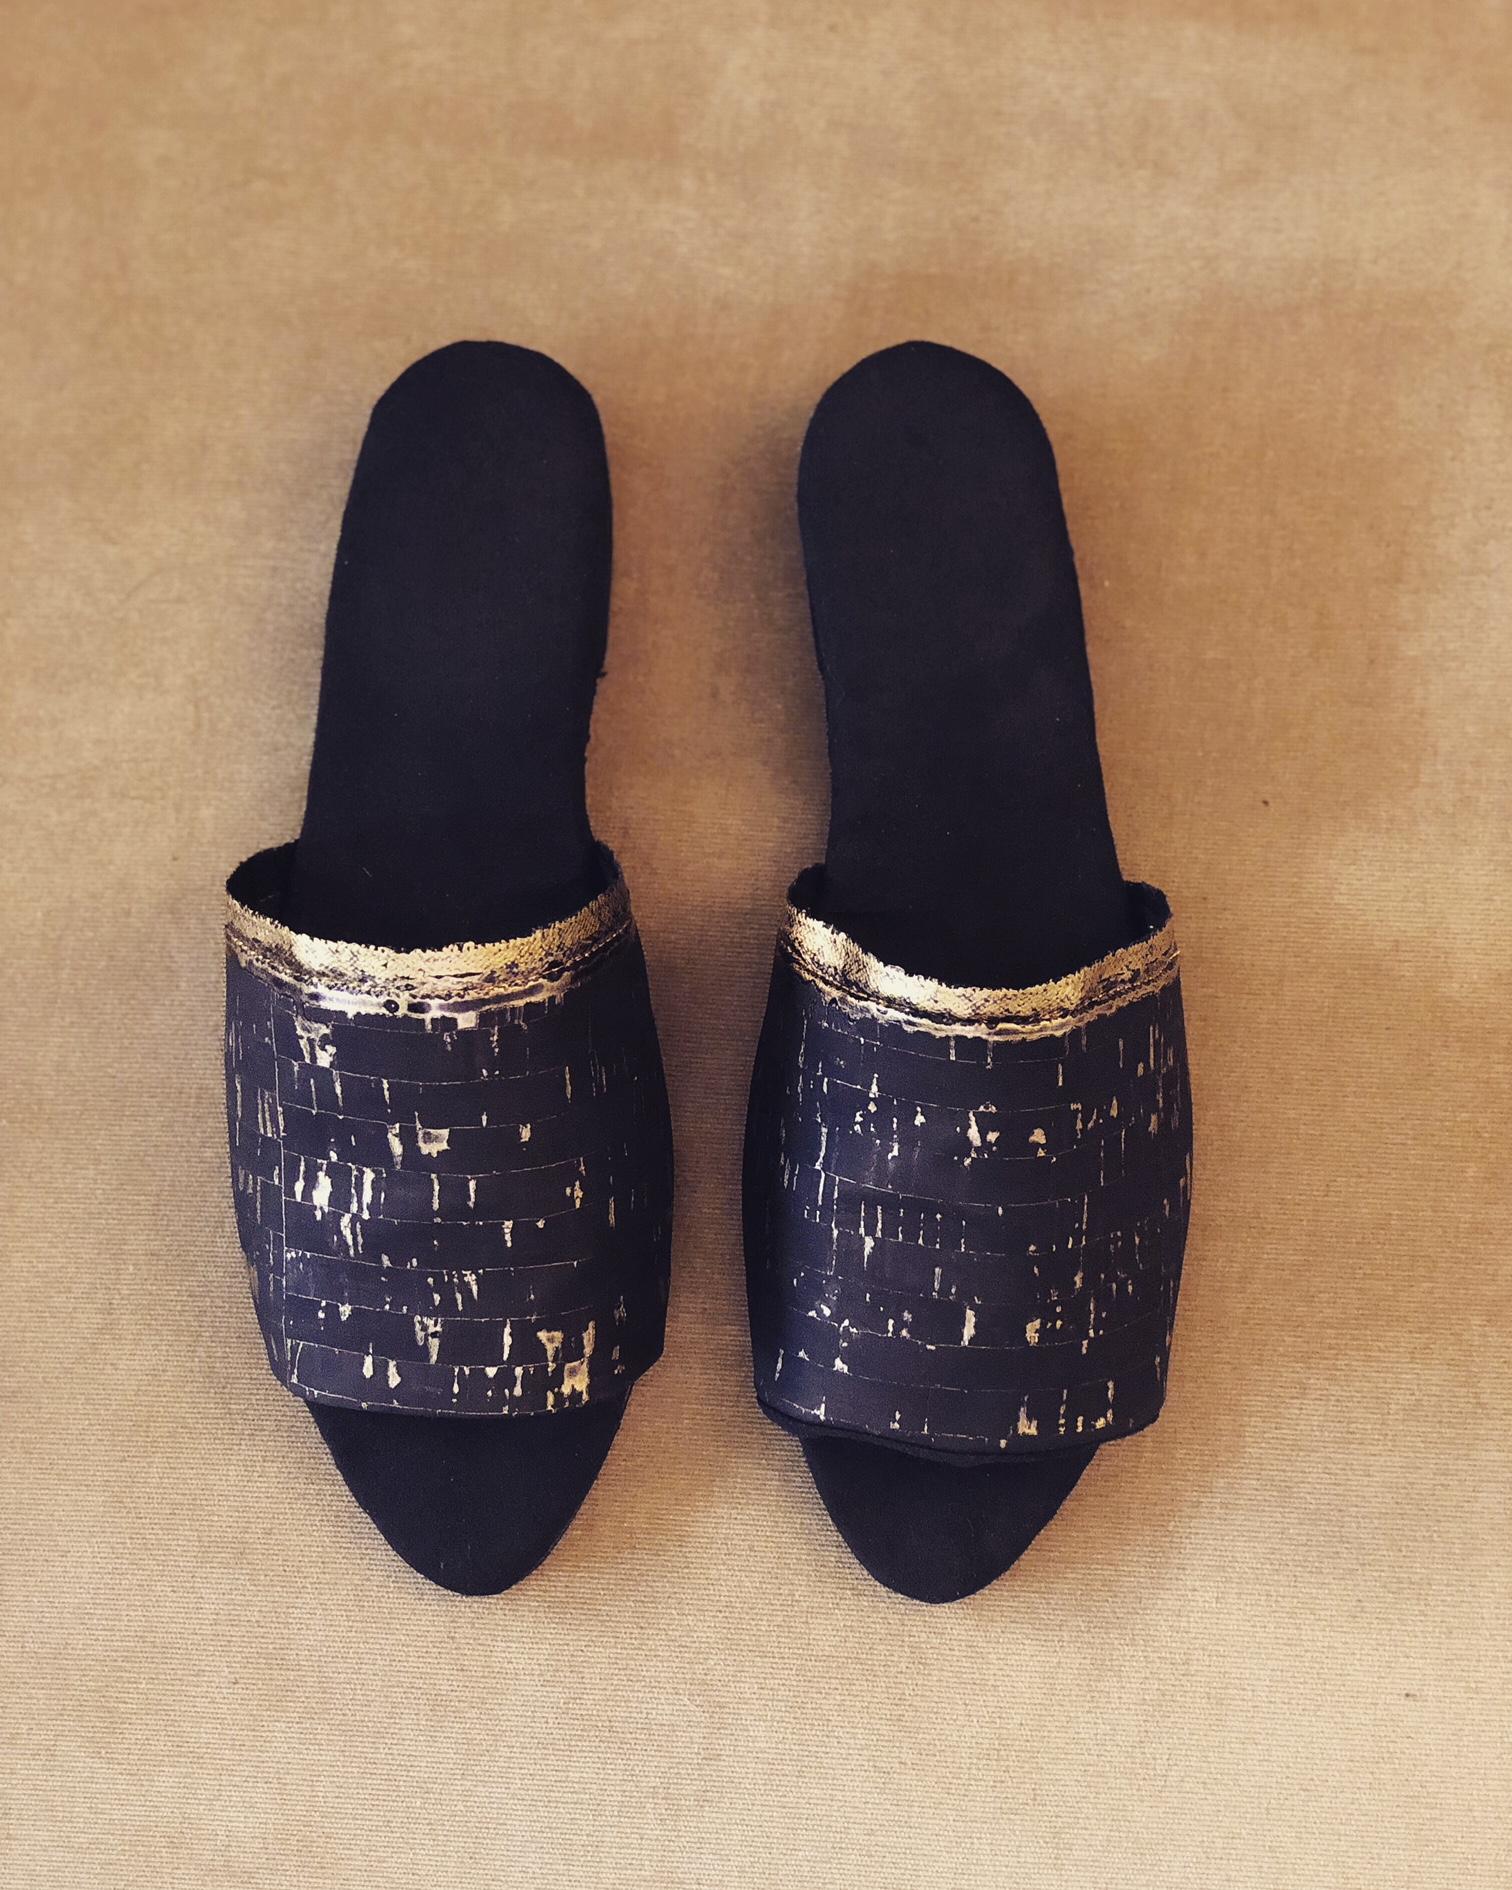 slides-cork fabric BLACK w/gold